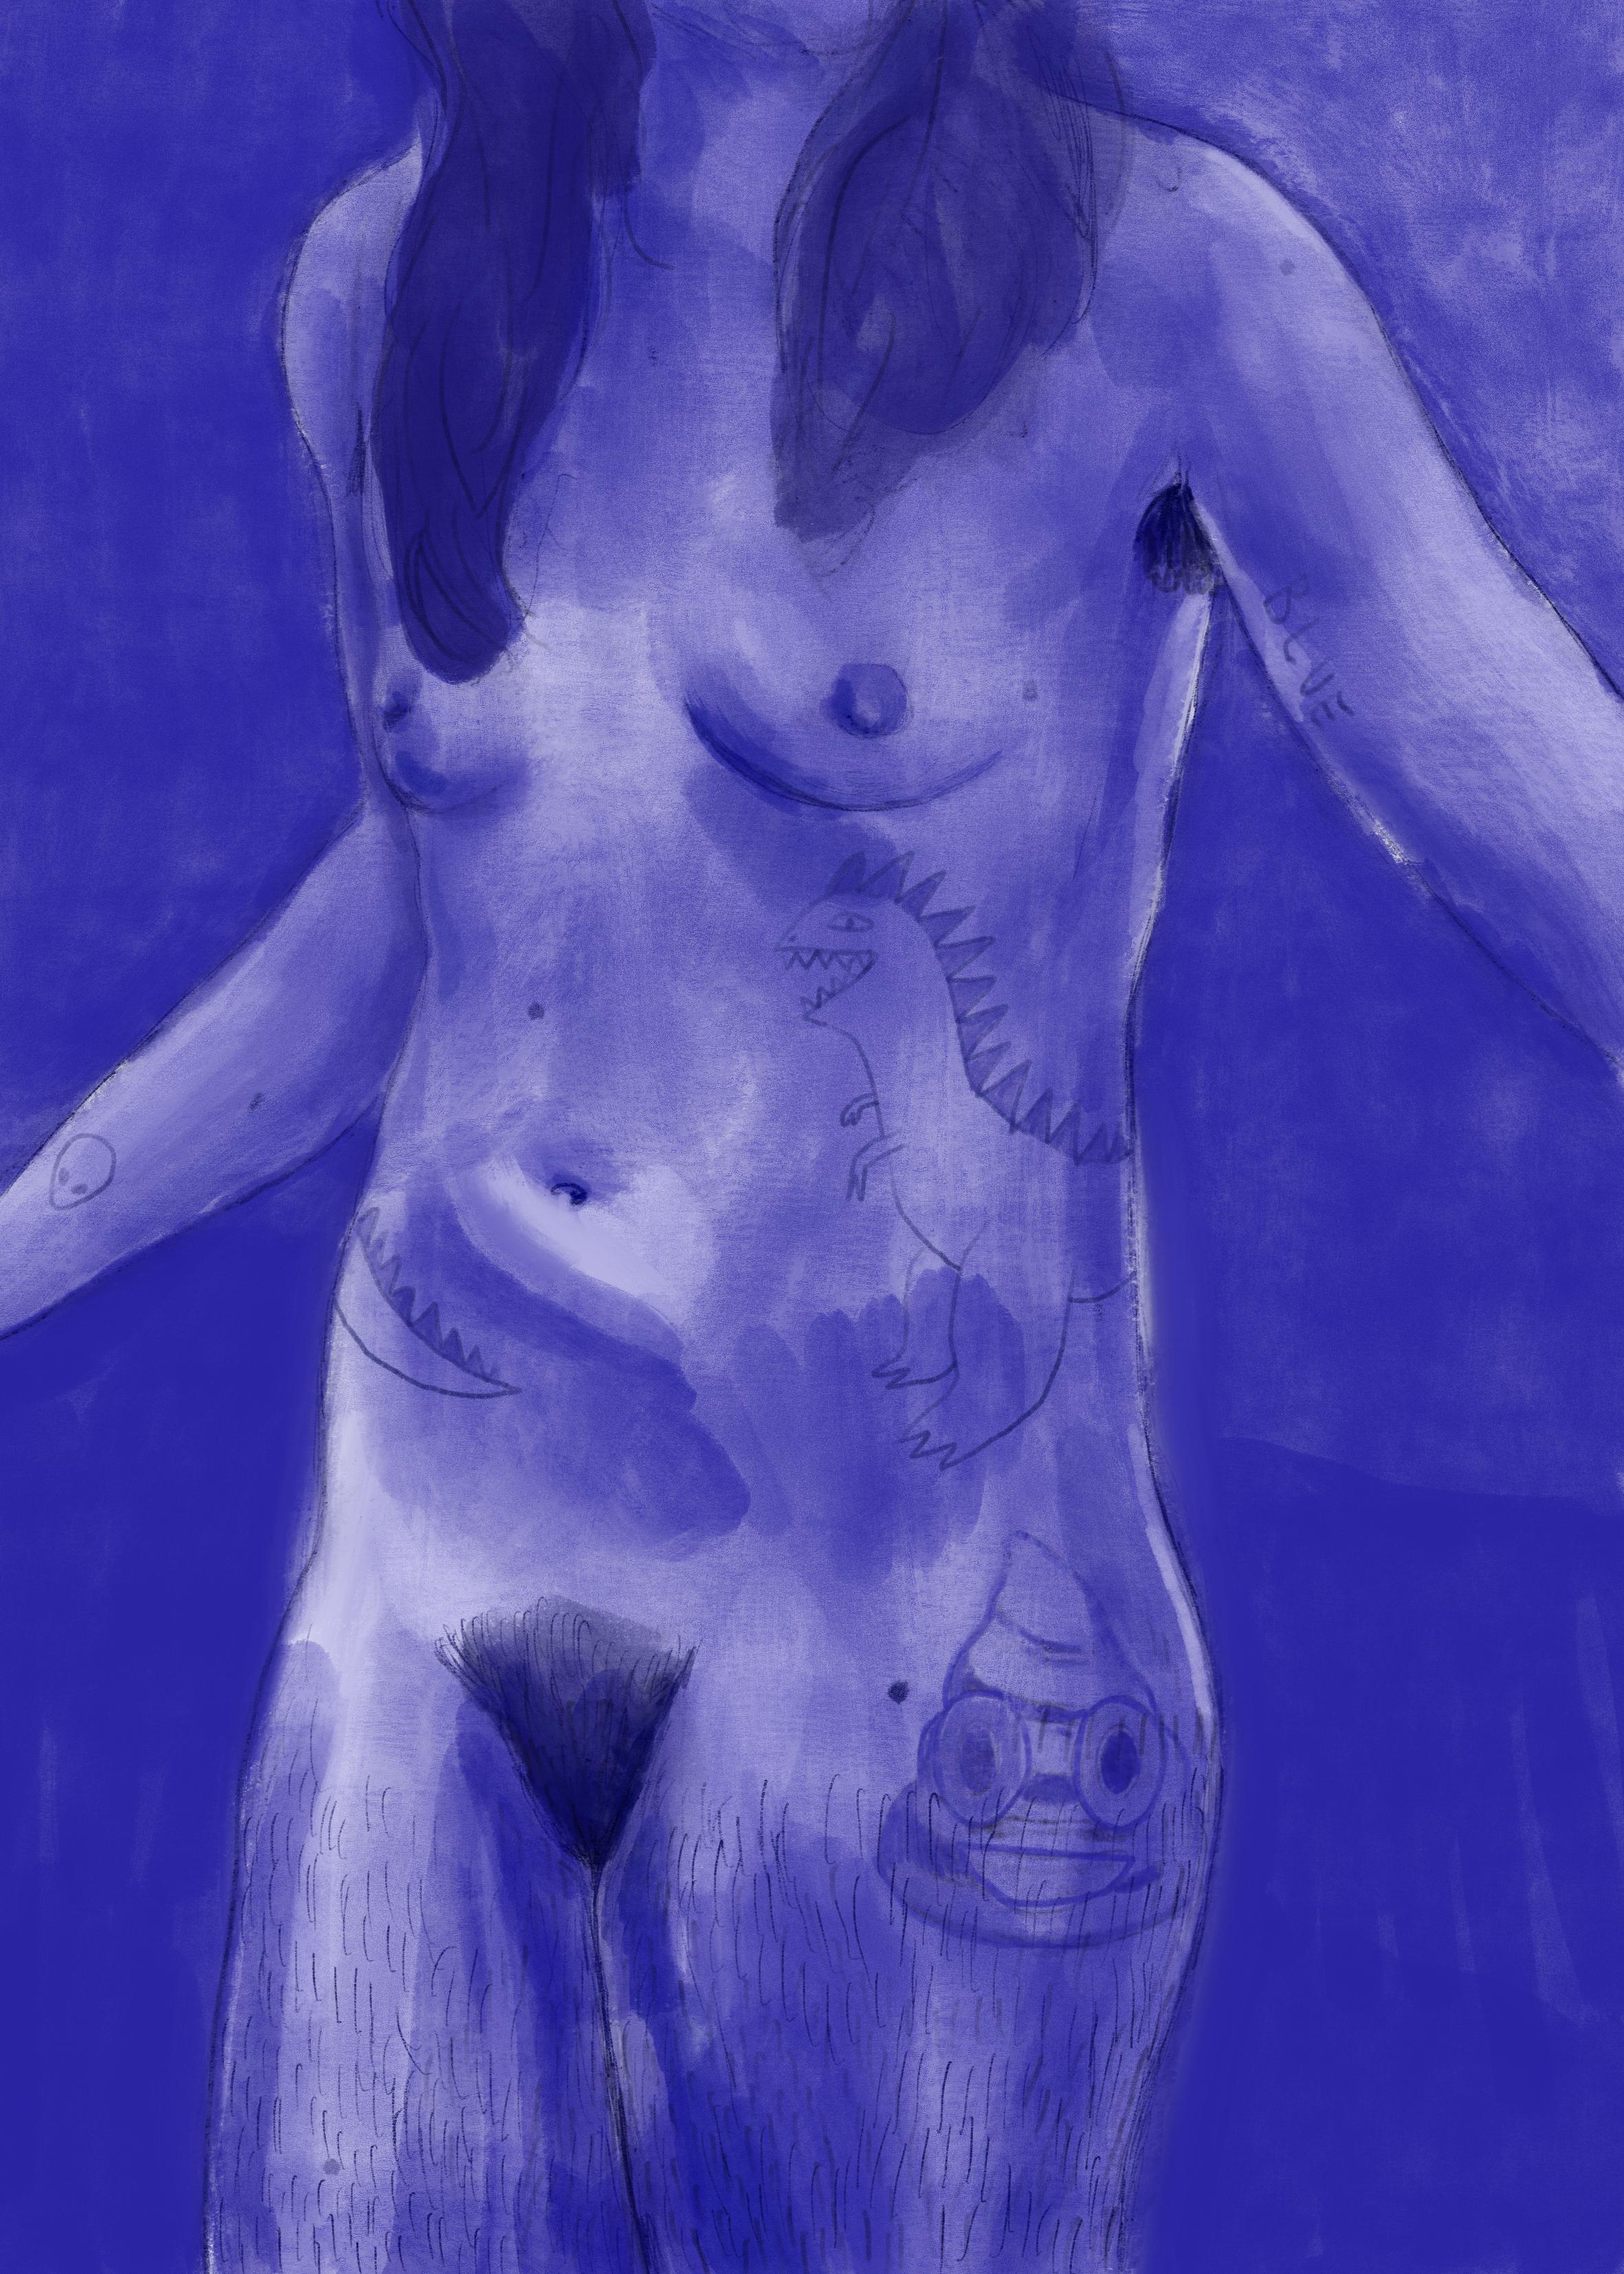 Illustration_sans_titre 2.png